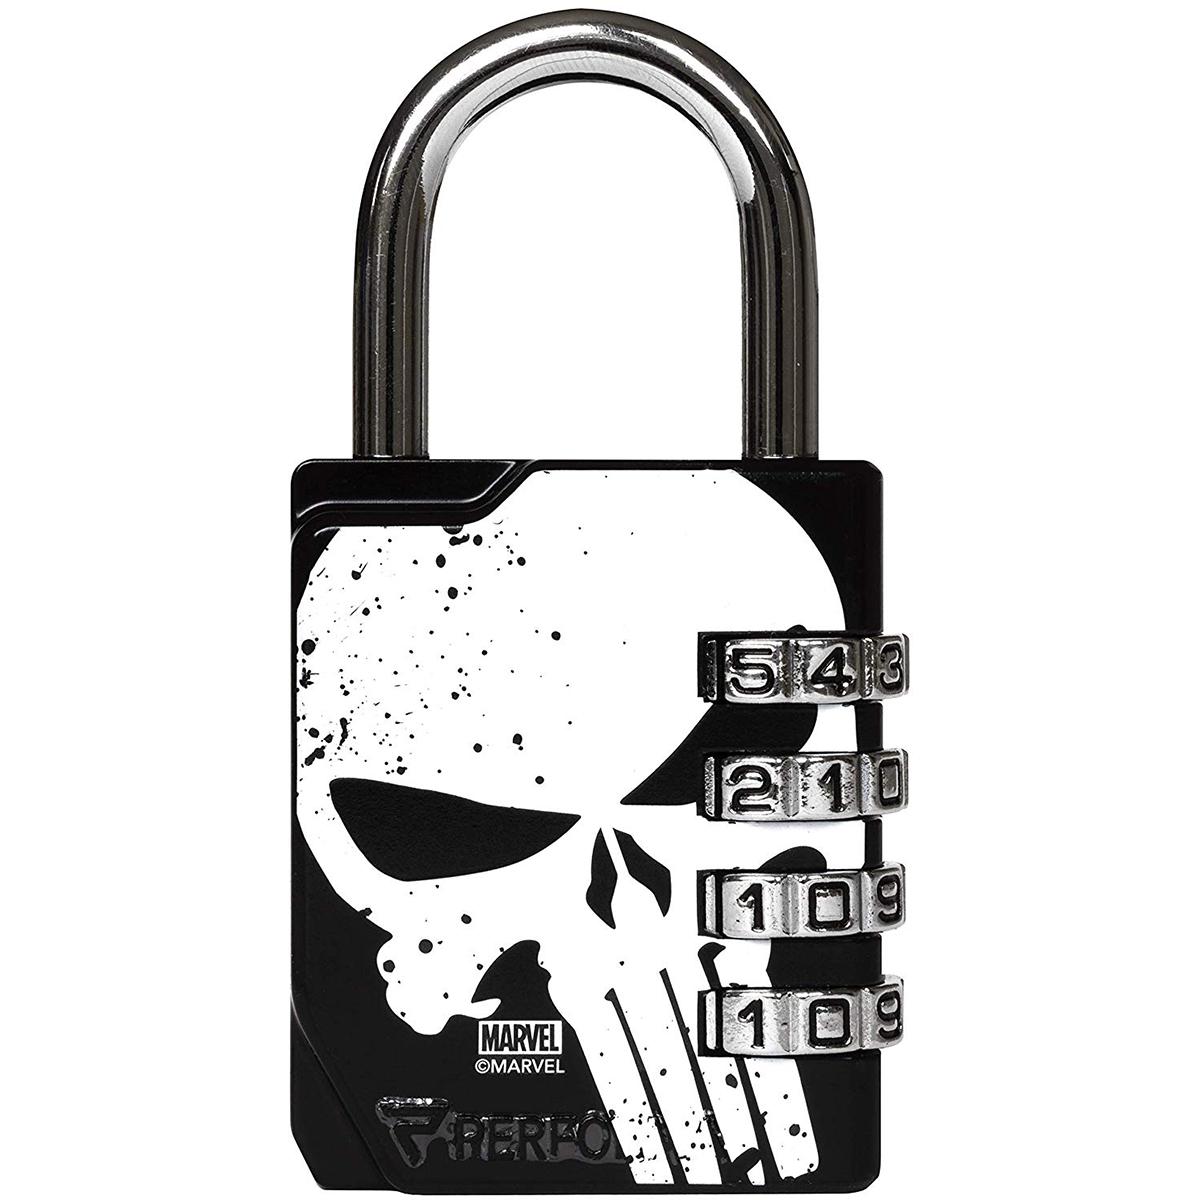 Black//Black Performa Ultra Premium Embossed 4-Dial Combination Gym Lock